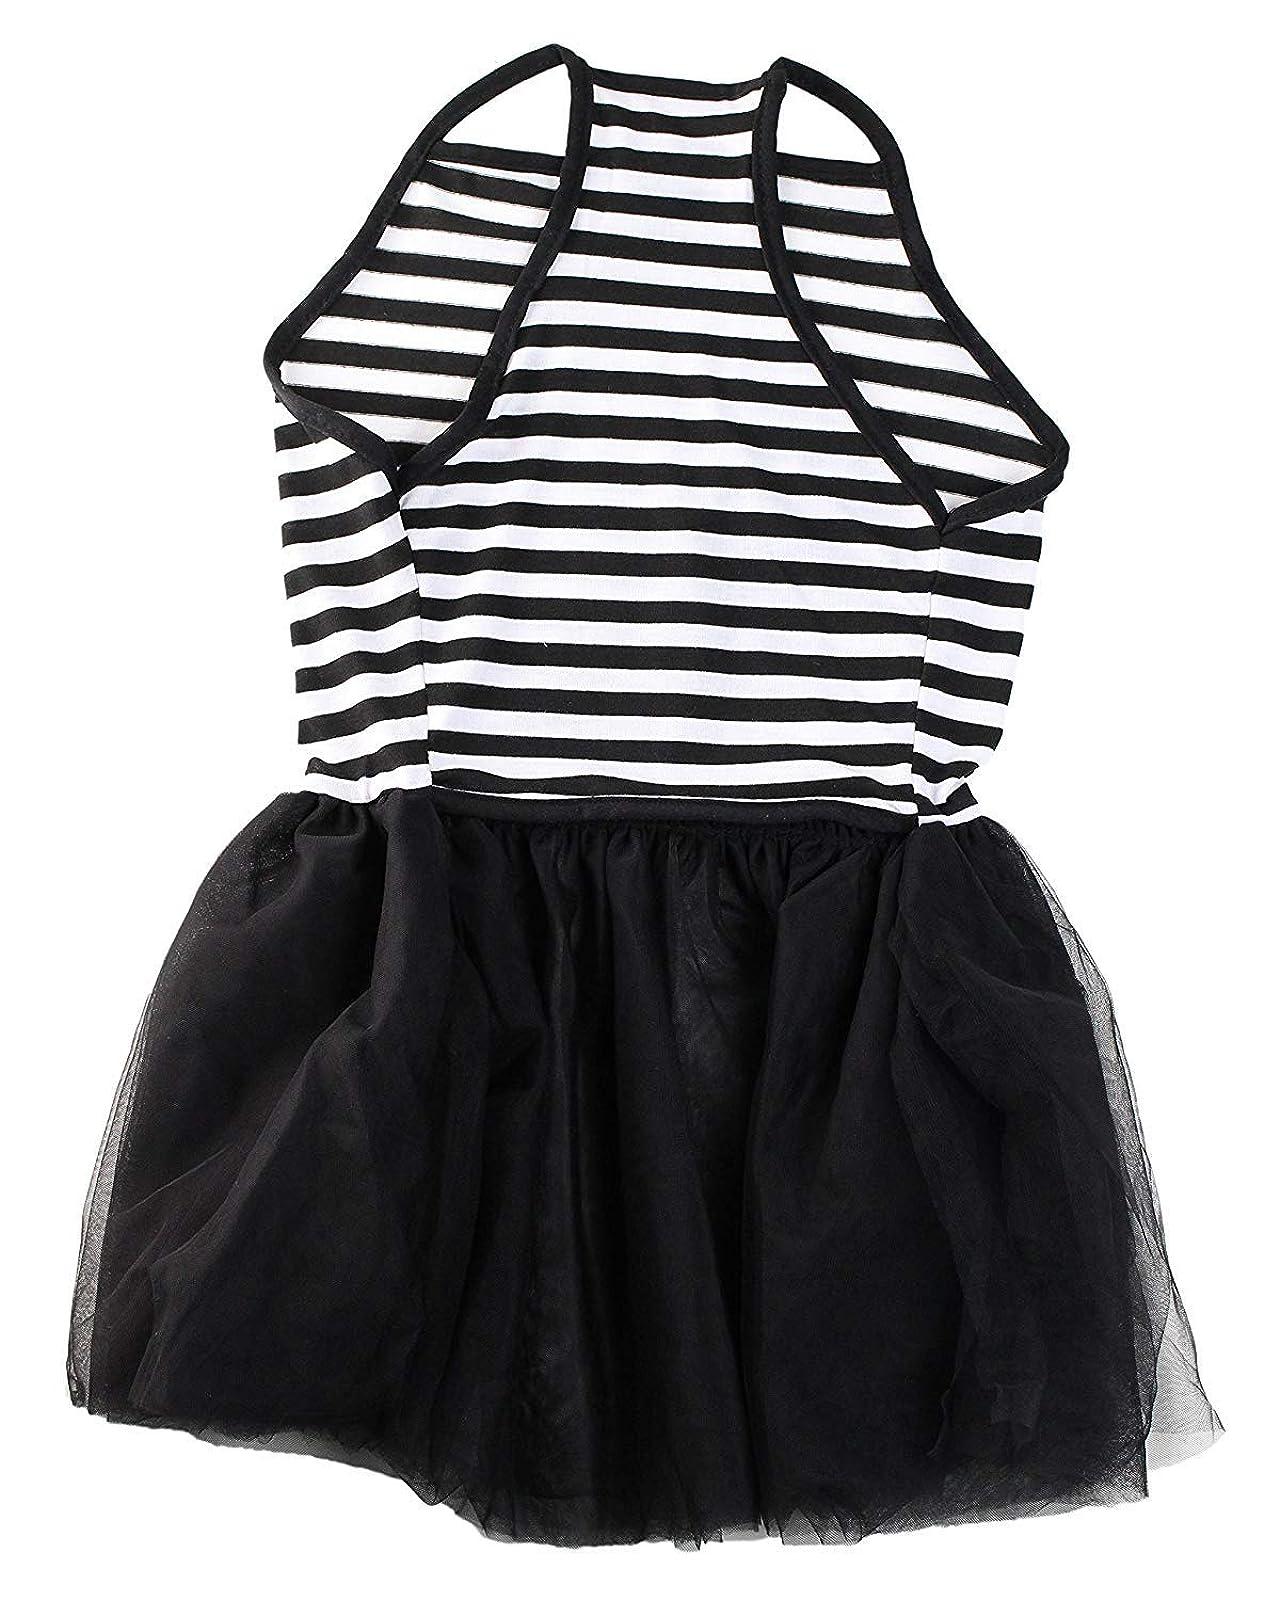 Midlee Elegant Black & White Stripe Tutu Large - 1